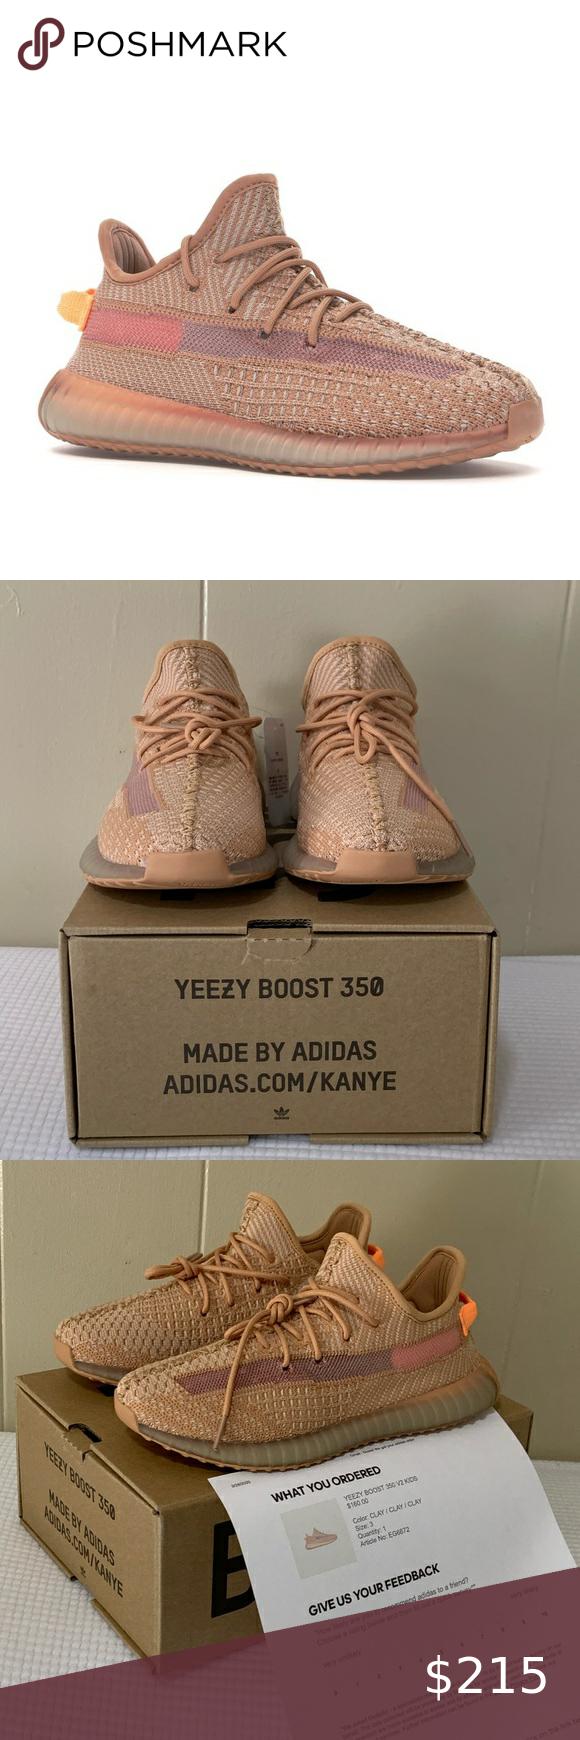 Yeezy Boost 350 V2 Clay Kids Size 3